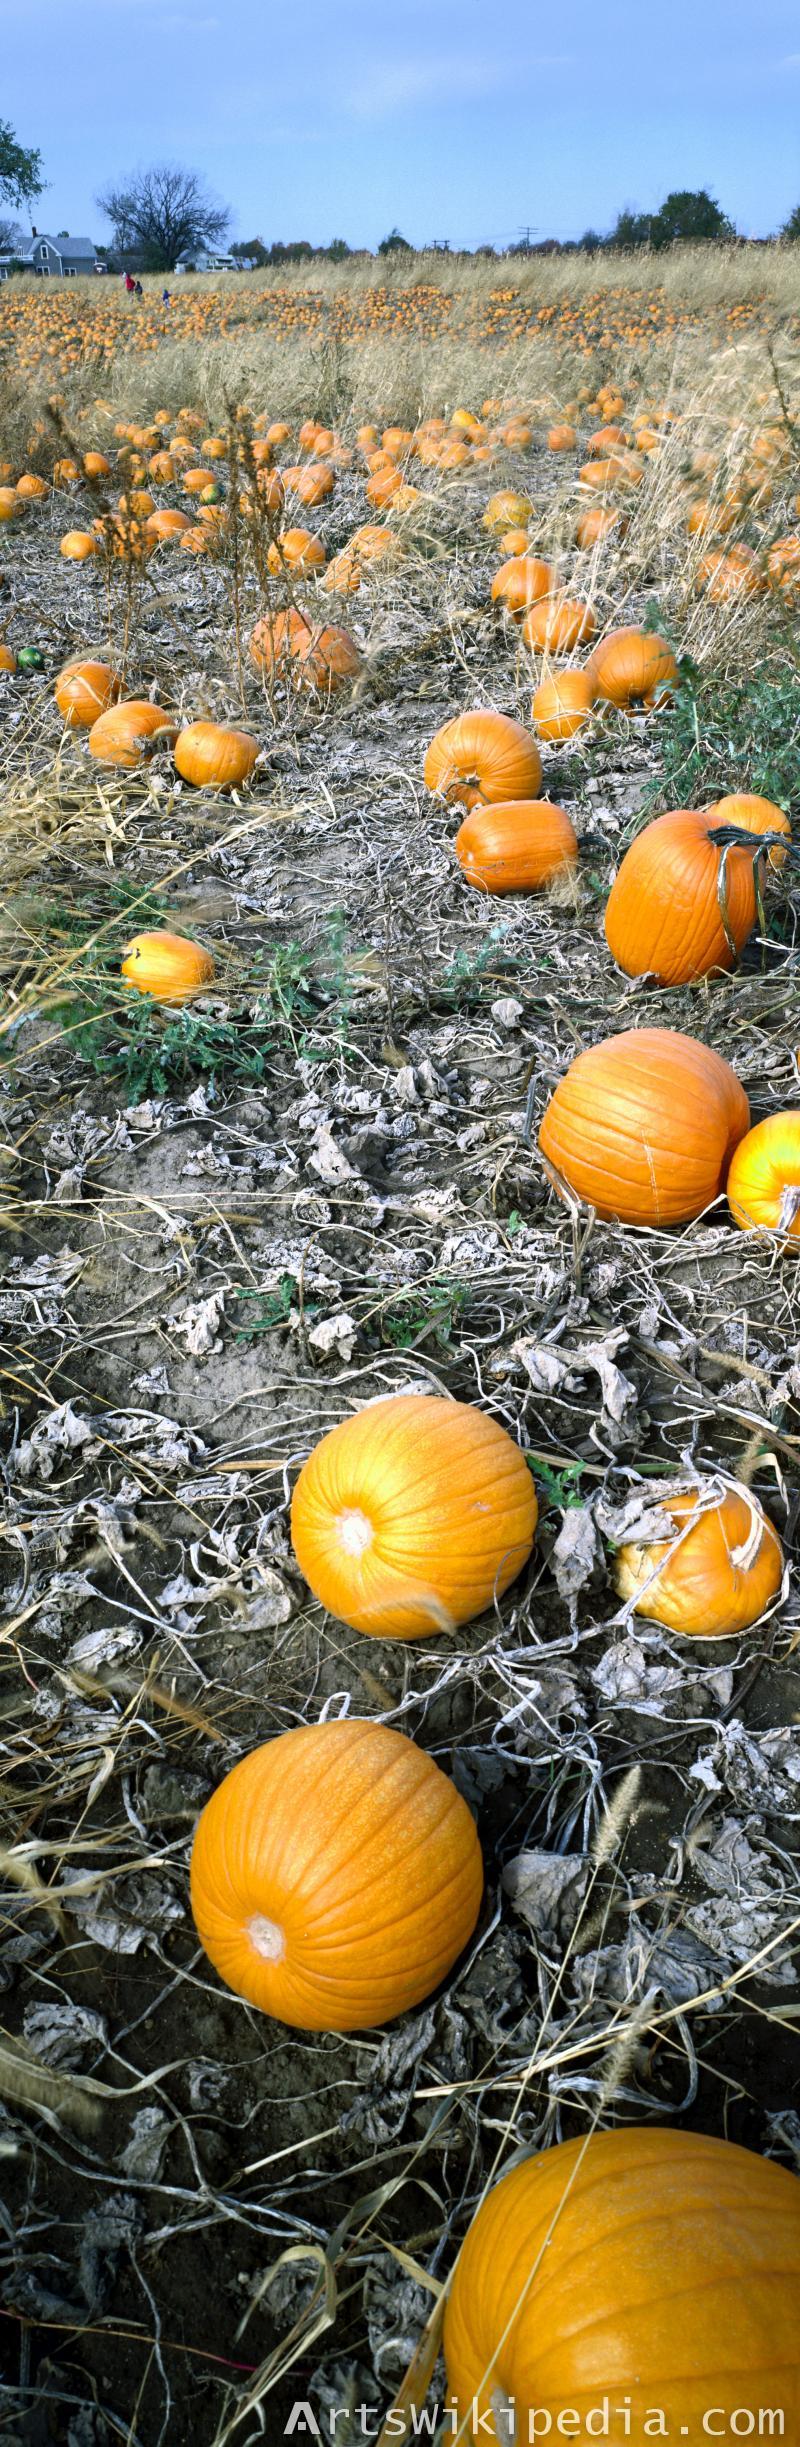 Free Pumpkin image